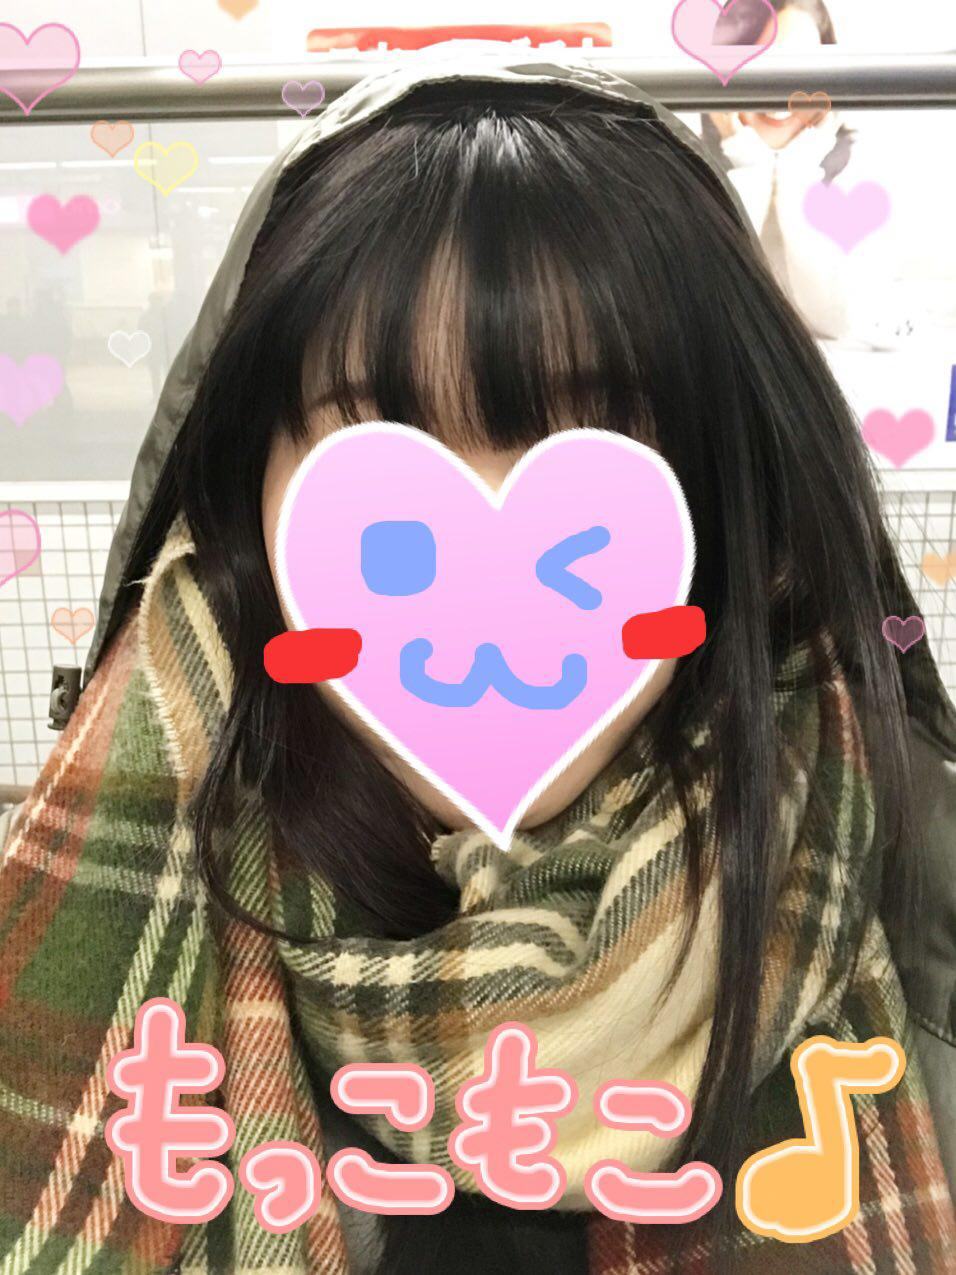 photo_2017-12-29_23-03-40.jpg